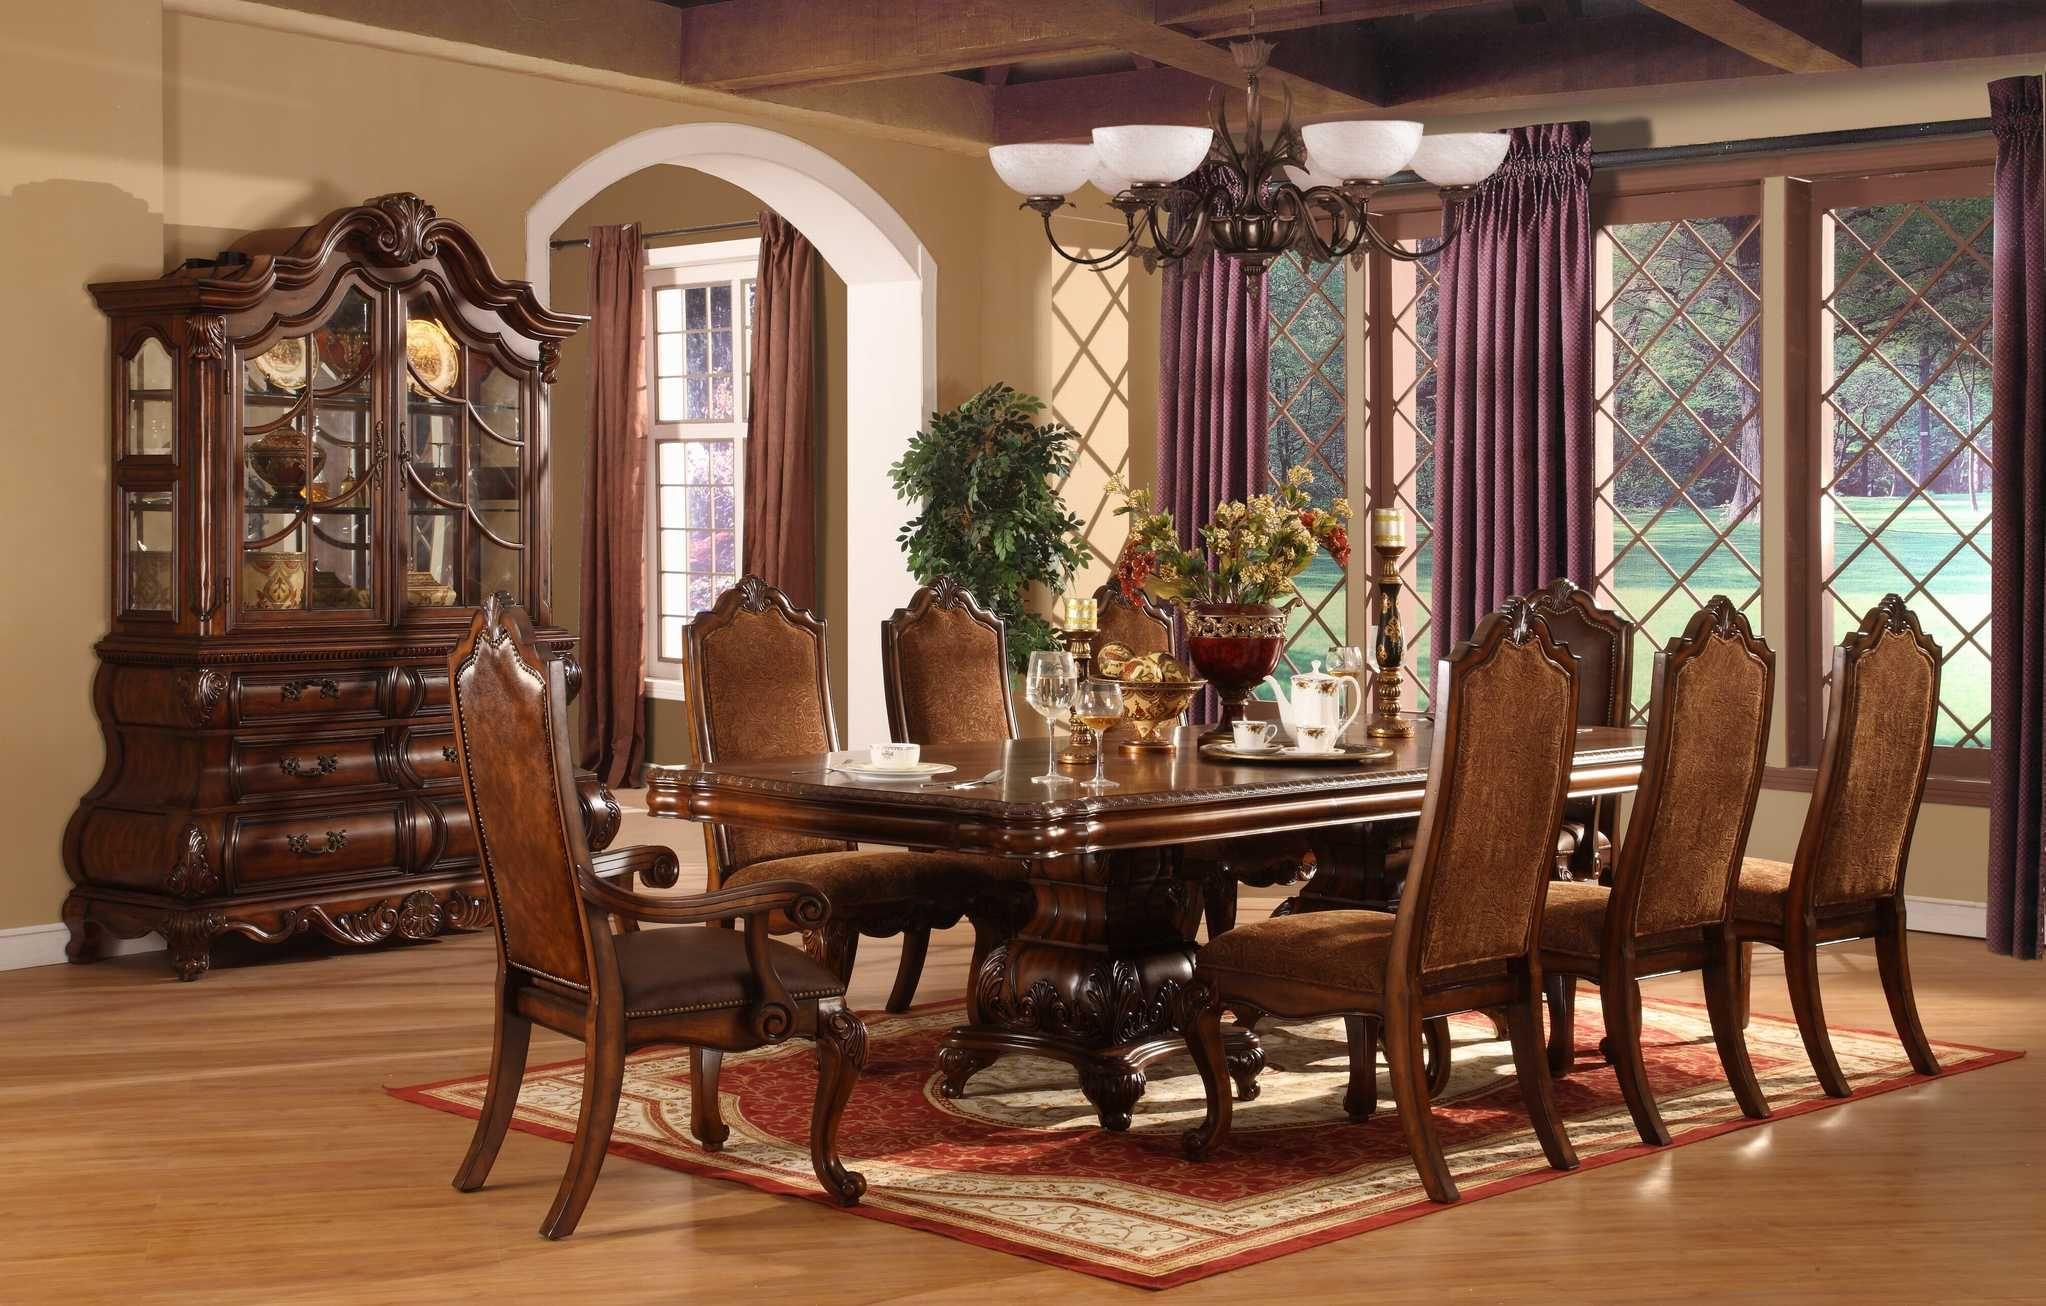 Elegant Formal Dining Room Sets Wooden Bams Ceiling Laminate Floor